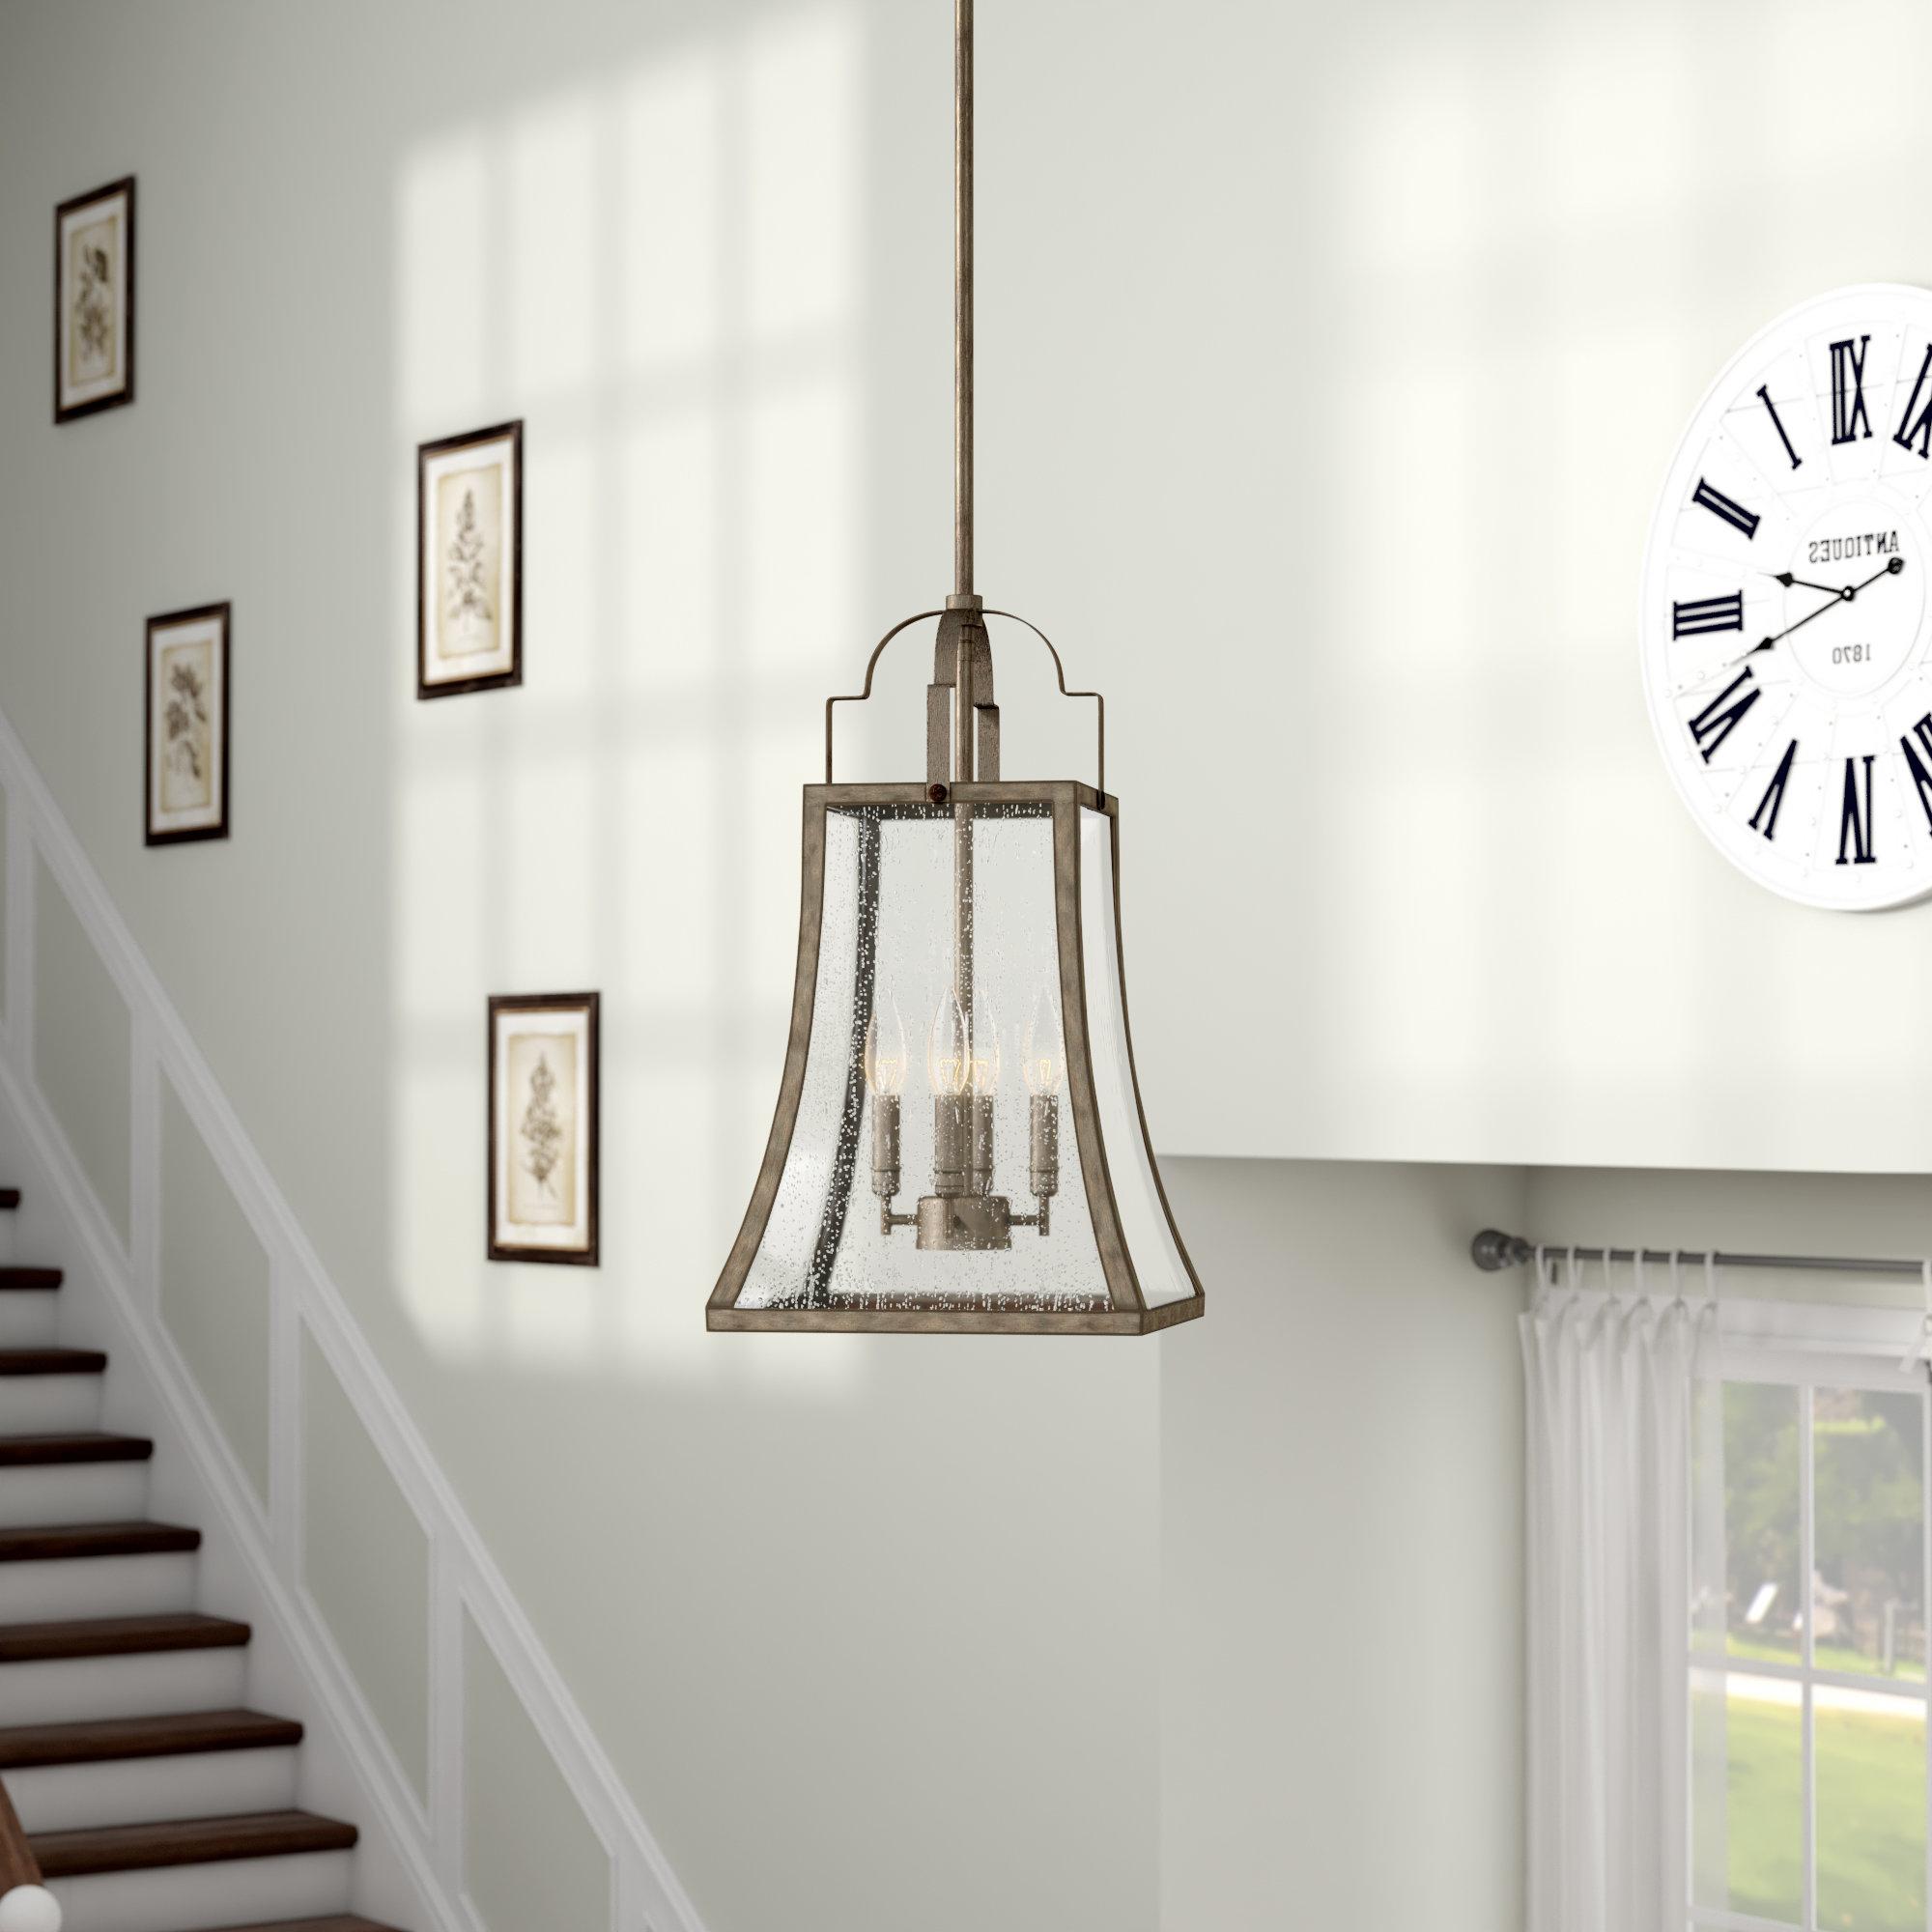 Best And Newest Montvert 4 Light Foyer Pendant Within Kierra 4 Light Unique / Statement Chandeliers (Gallery 18 of 20)